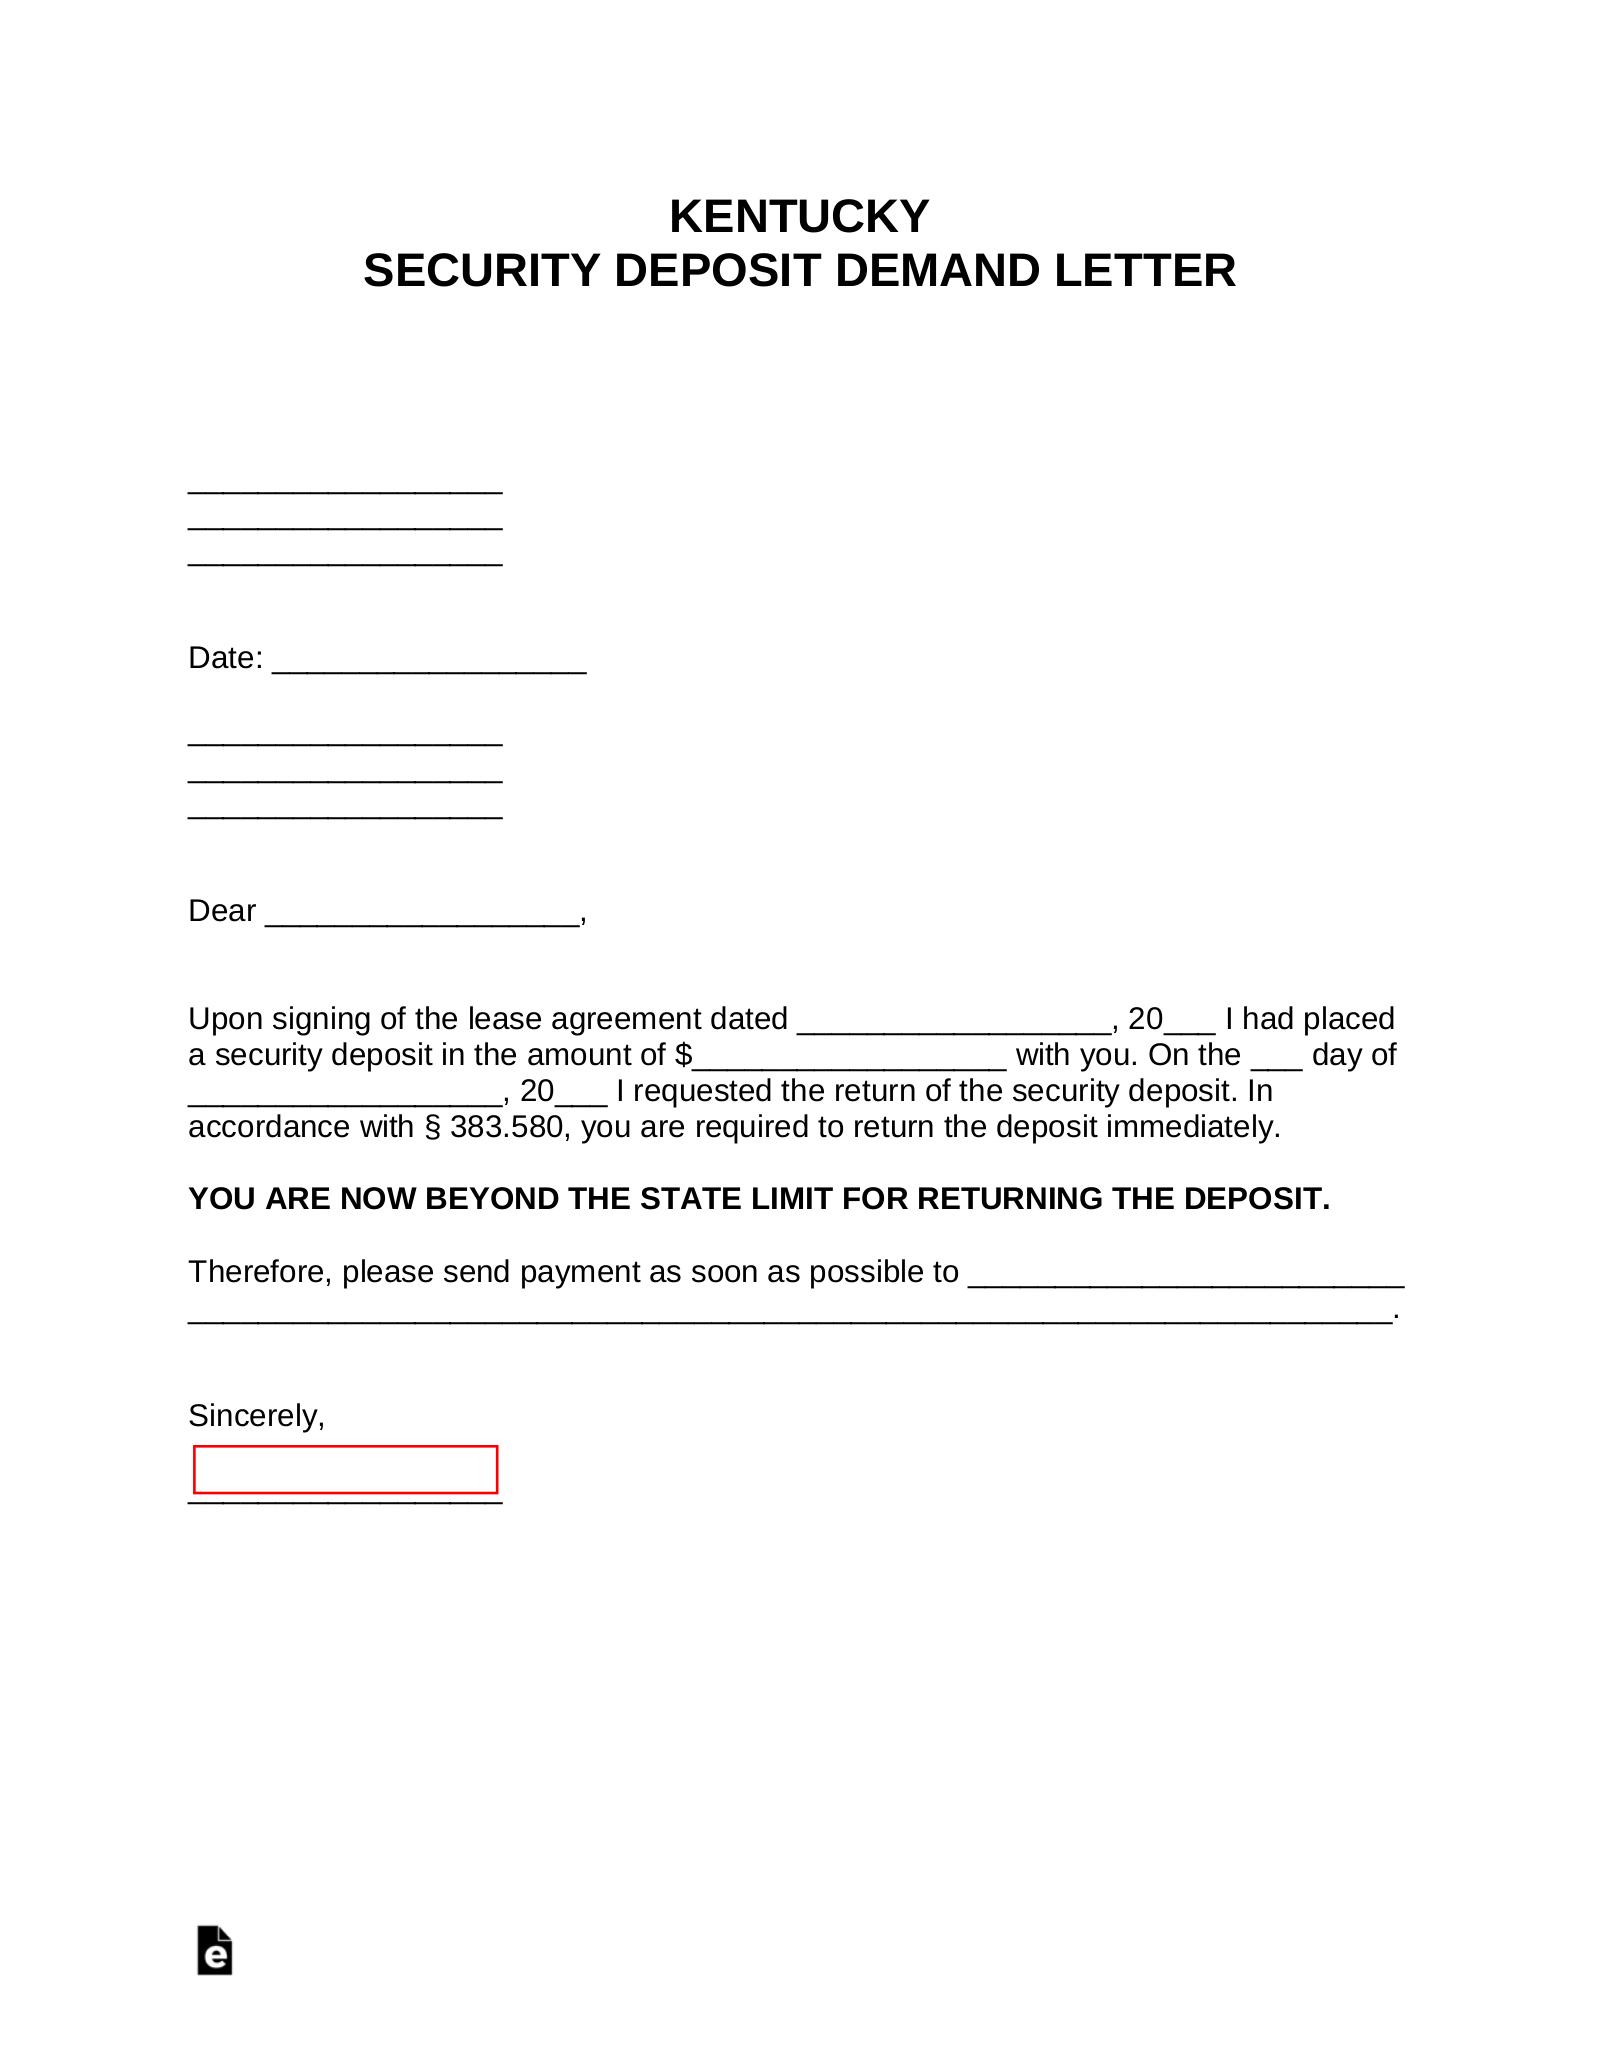 Free Kentucky Security Deposit Demand Letter - PDF | Word